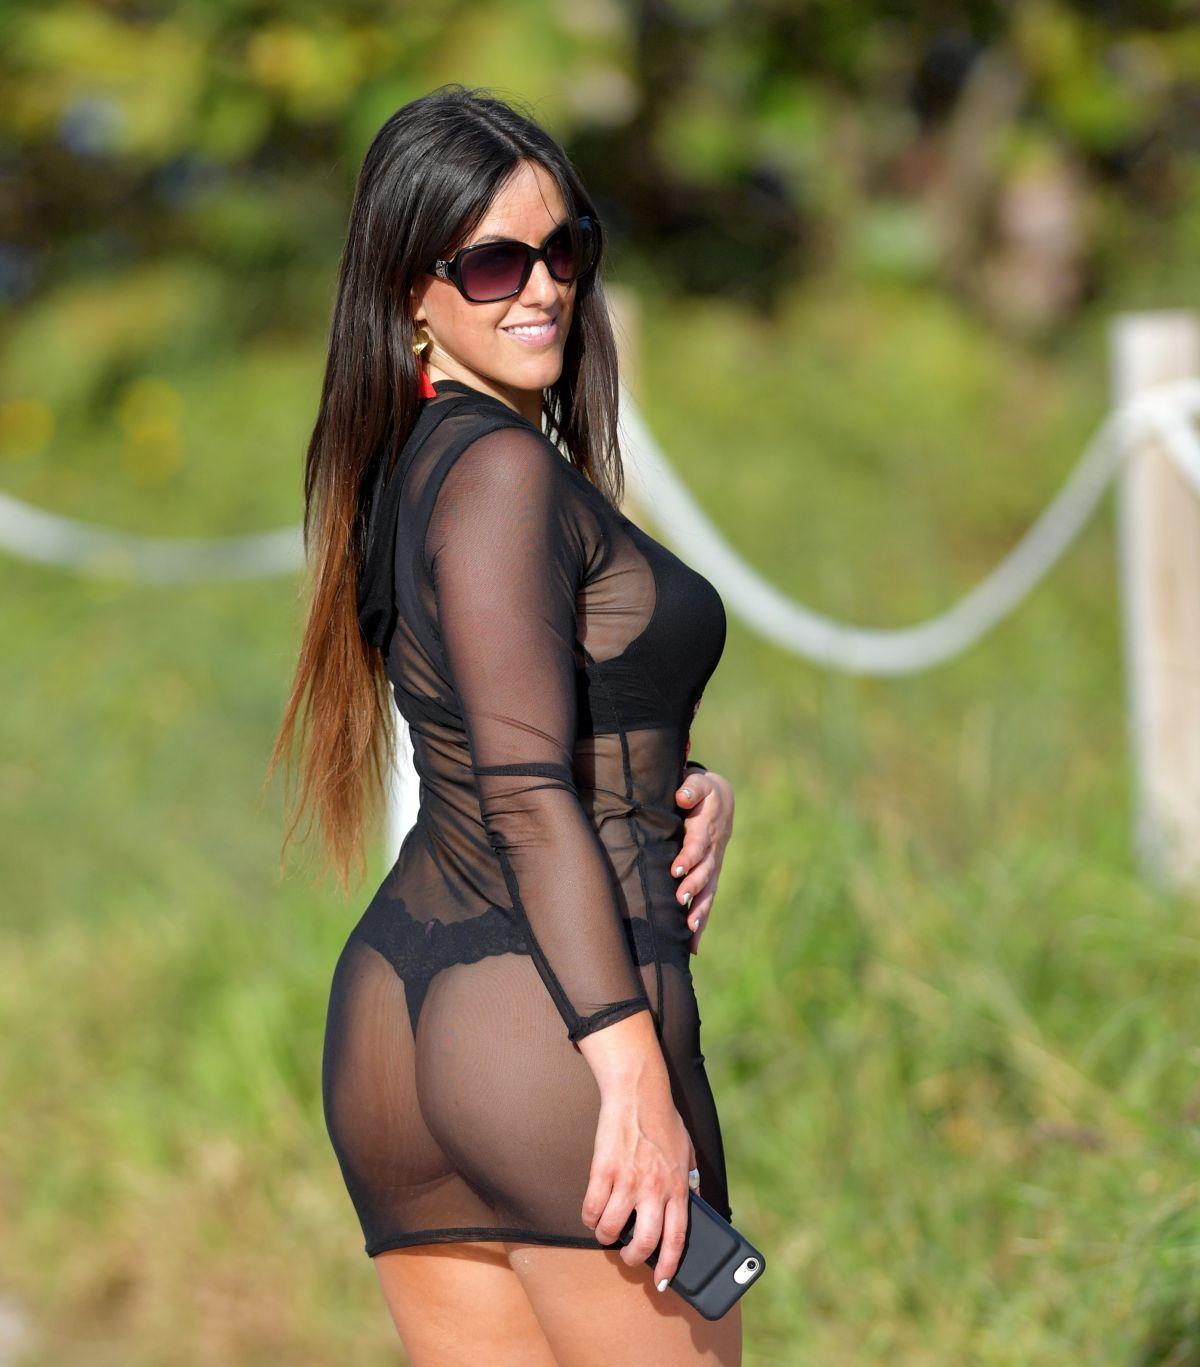 Claudia romani see through - 2019 year